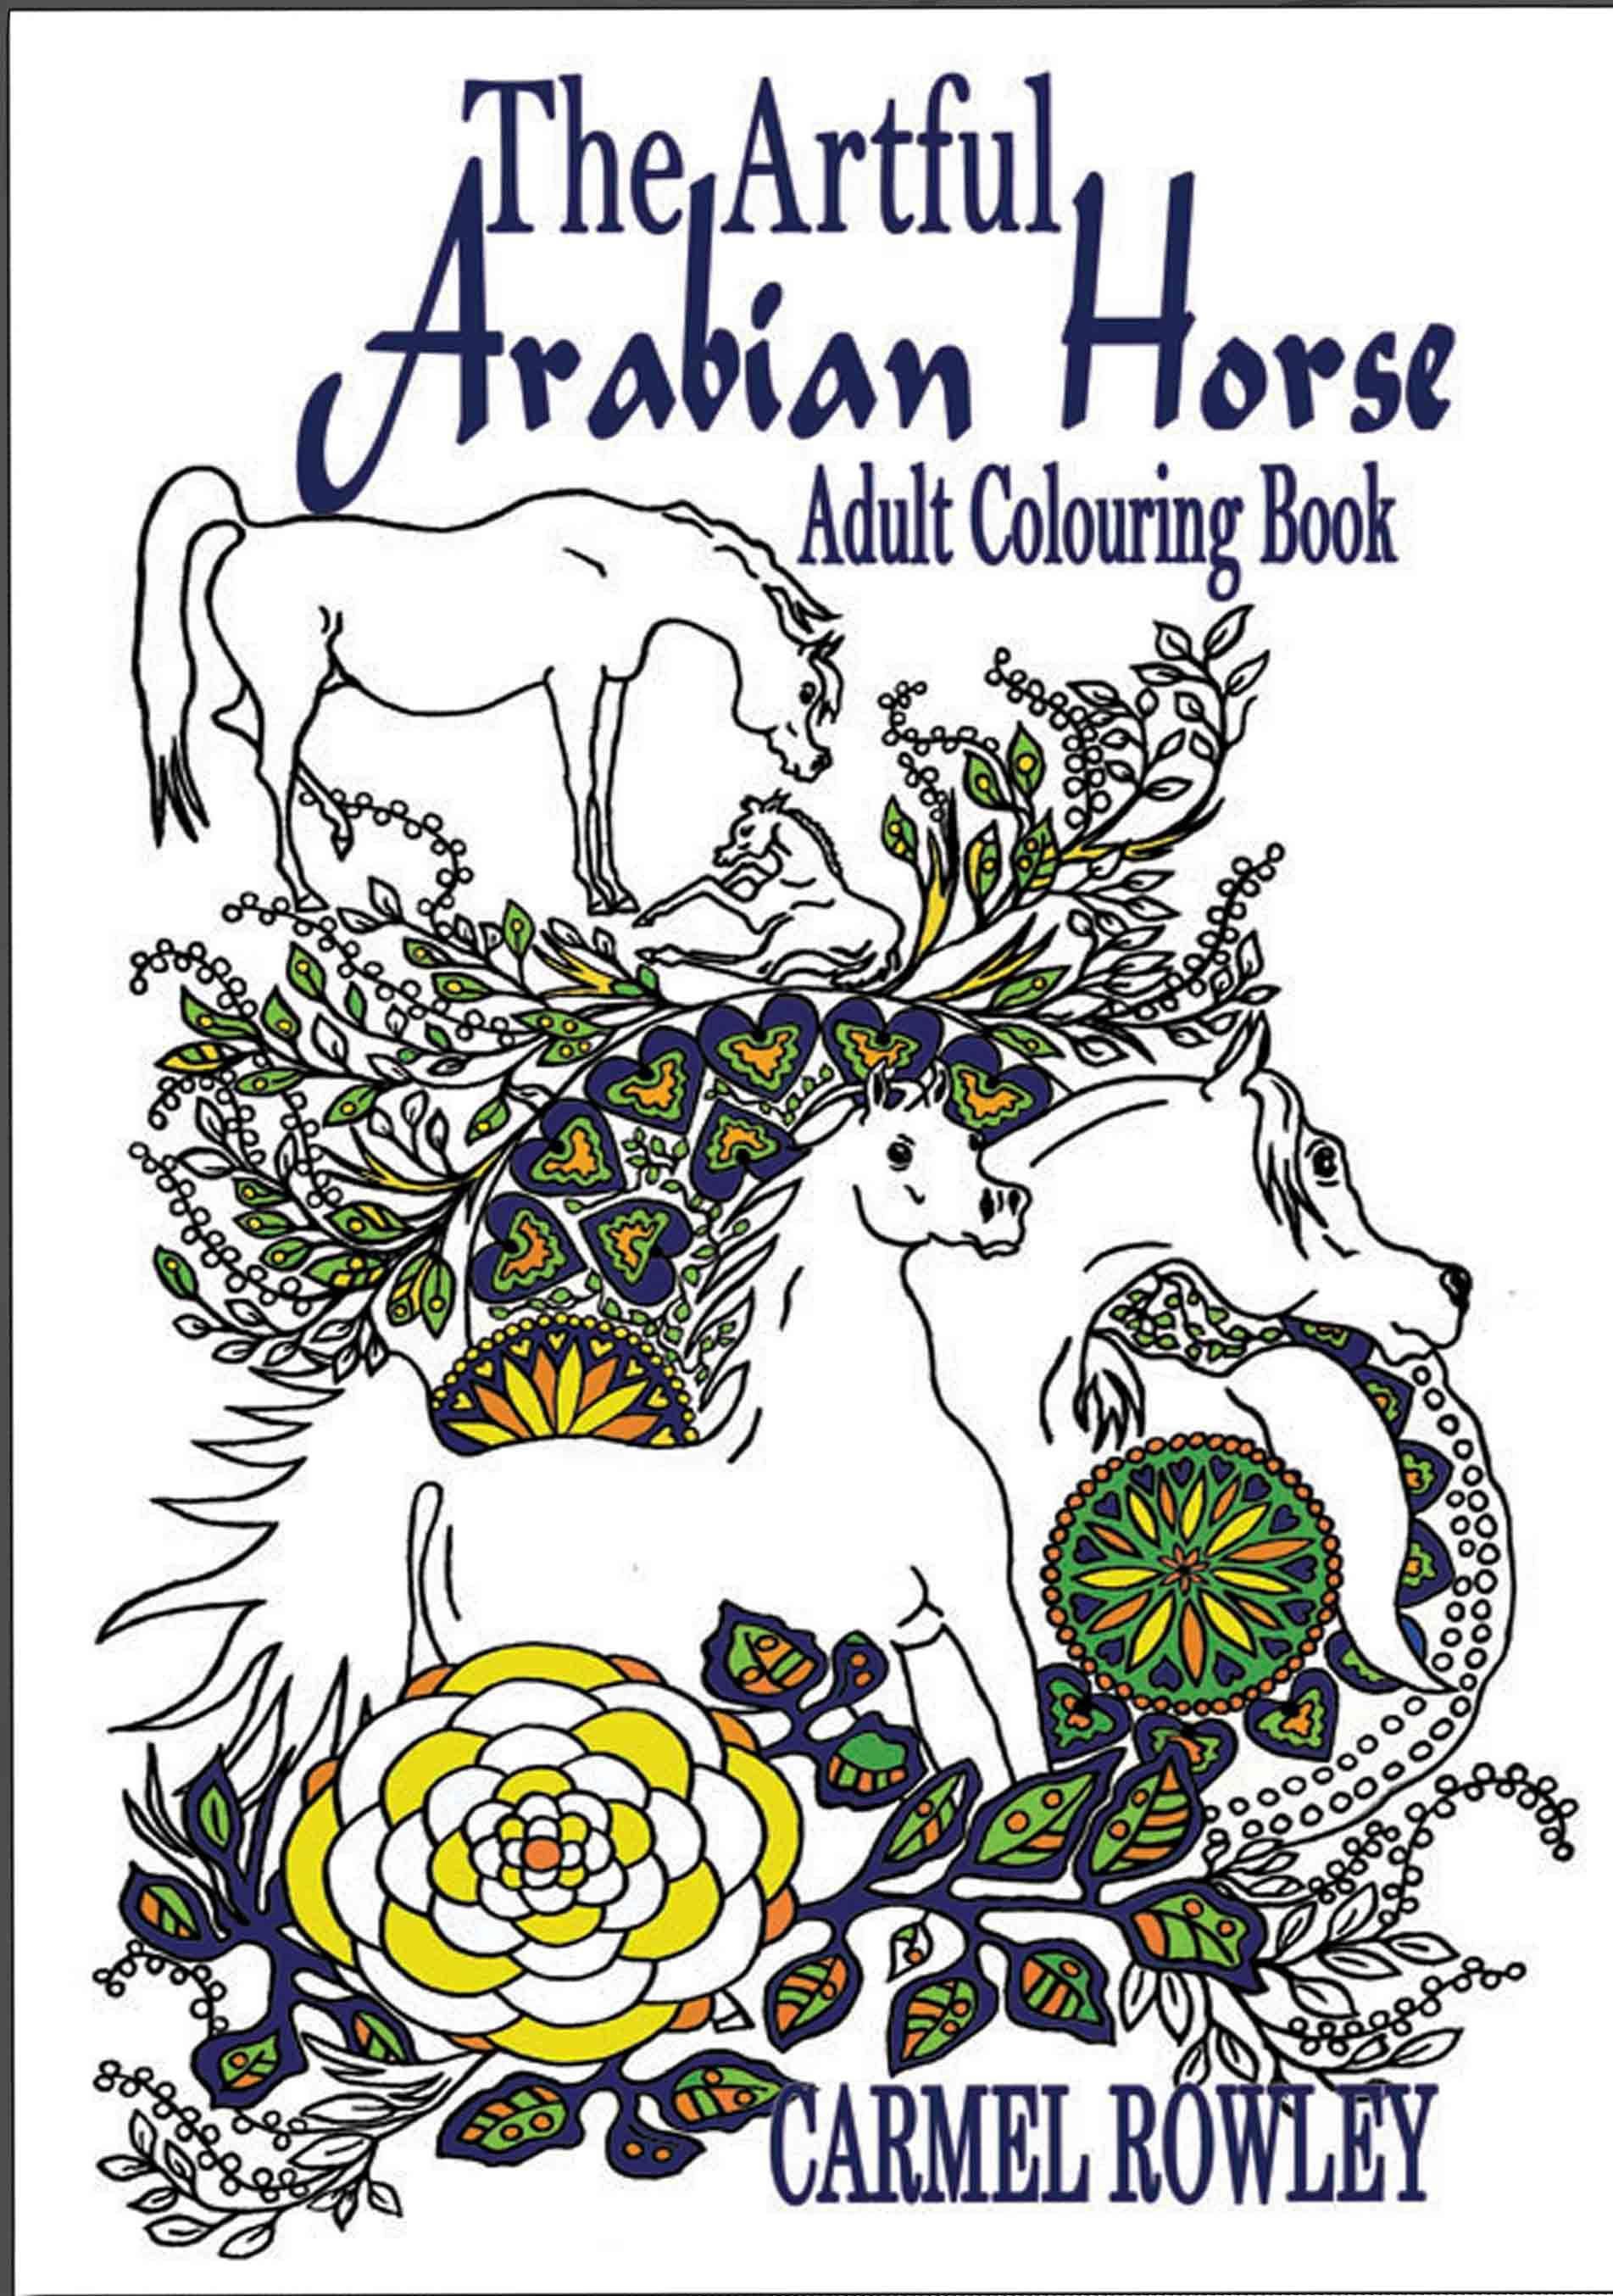 The Artful Arabian Horse Adult Colouring Book